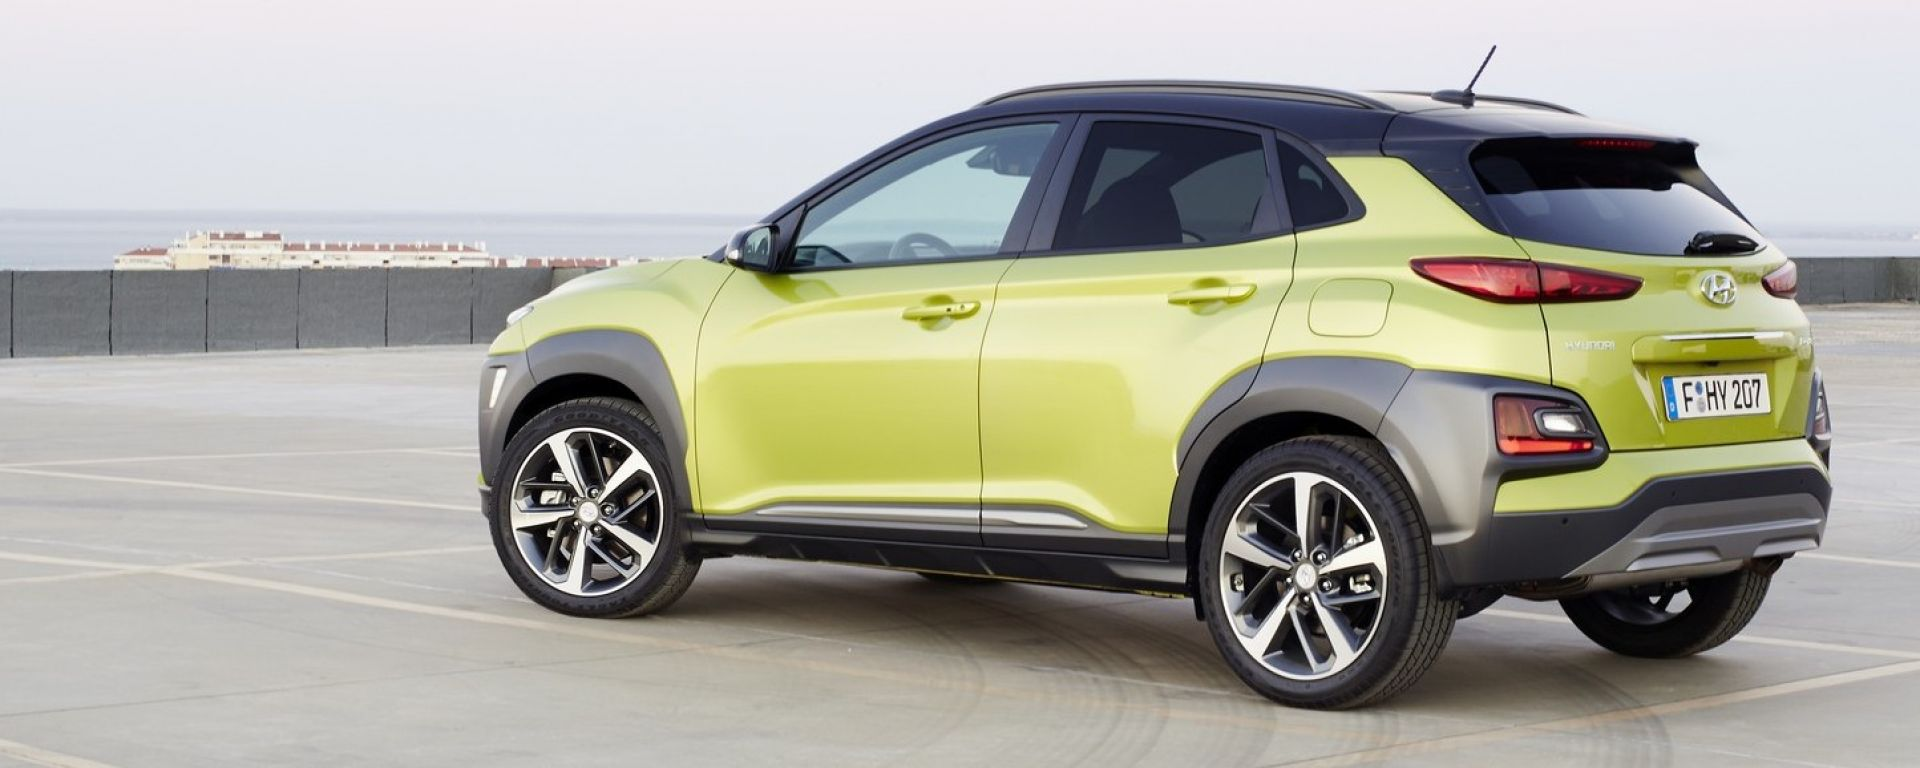 Hyundai Kona, a Ginevra arriva la versione elettrica